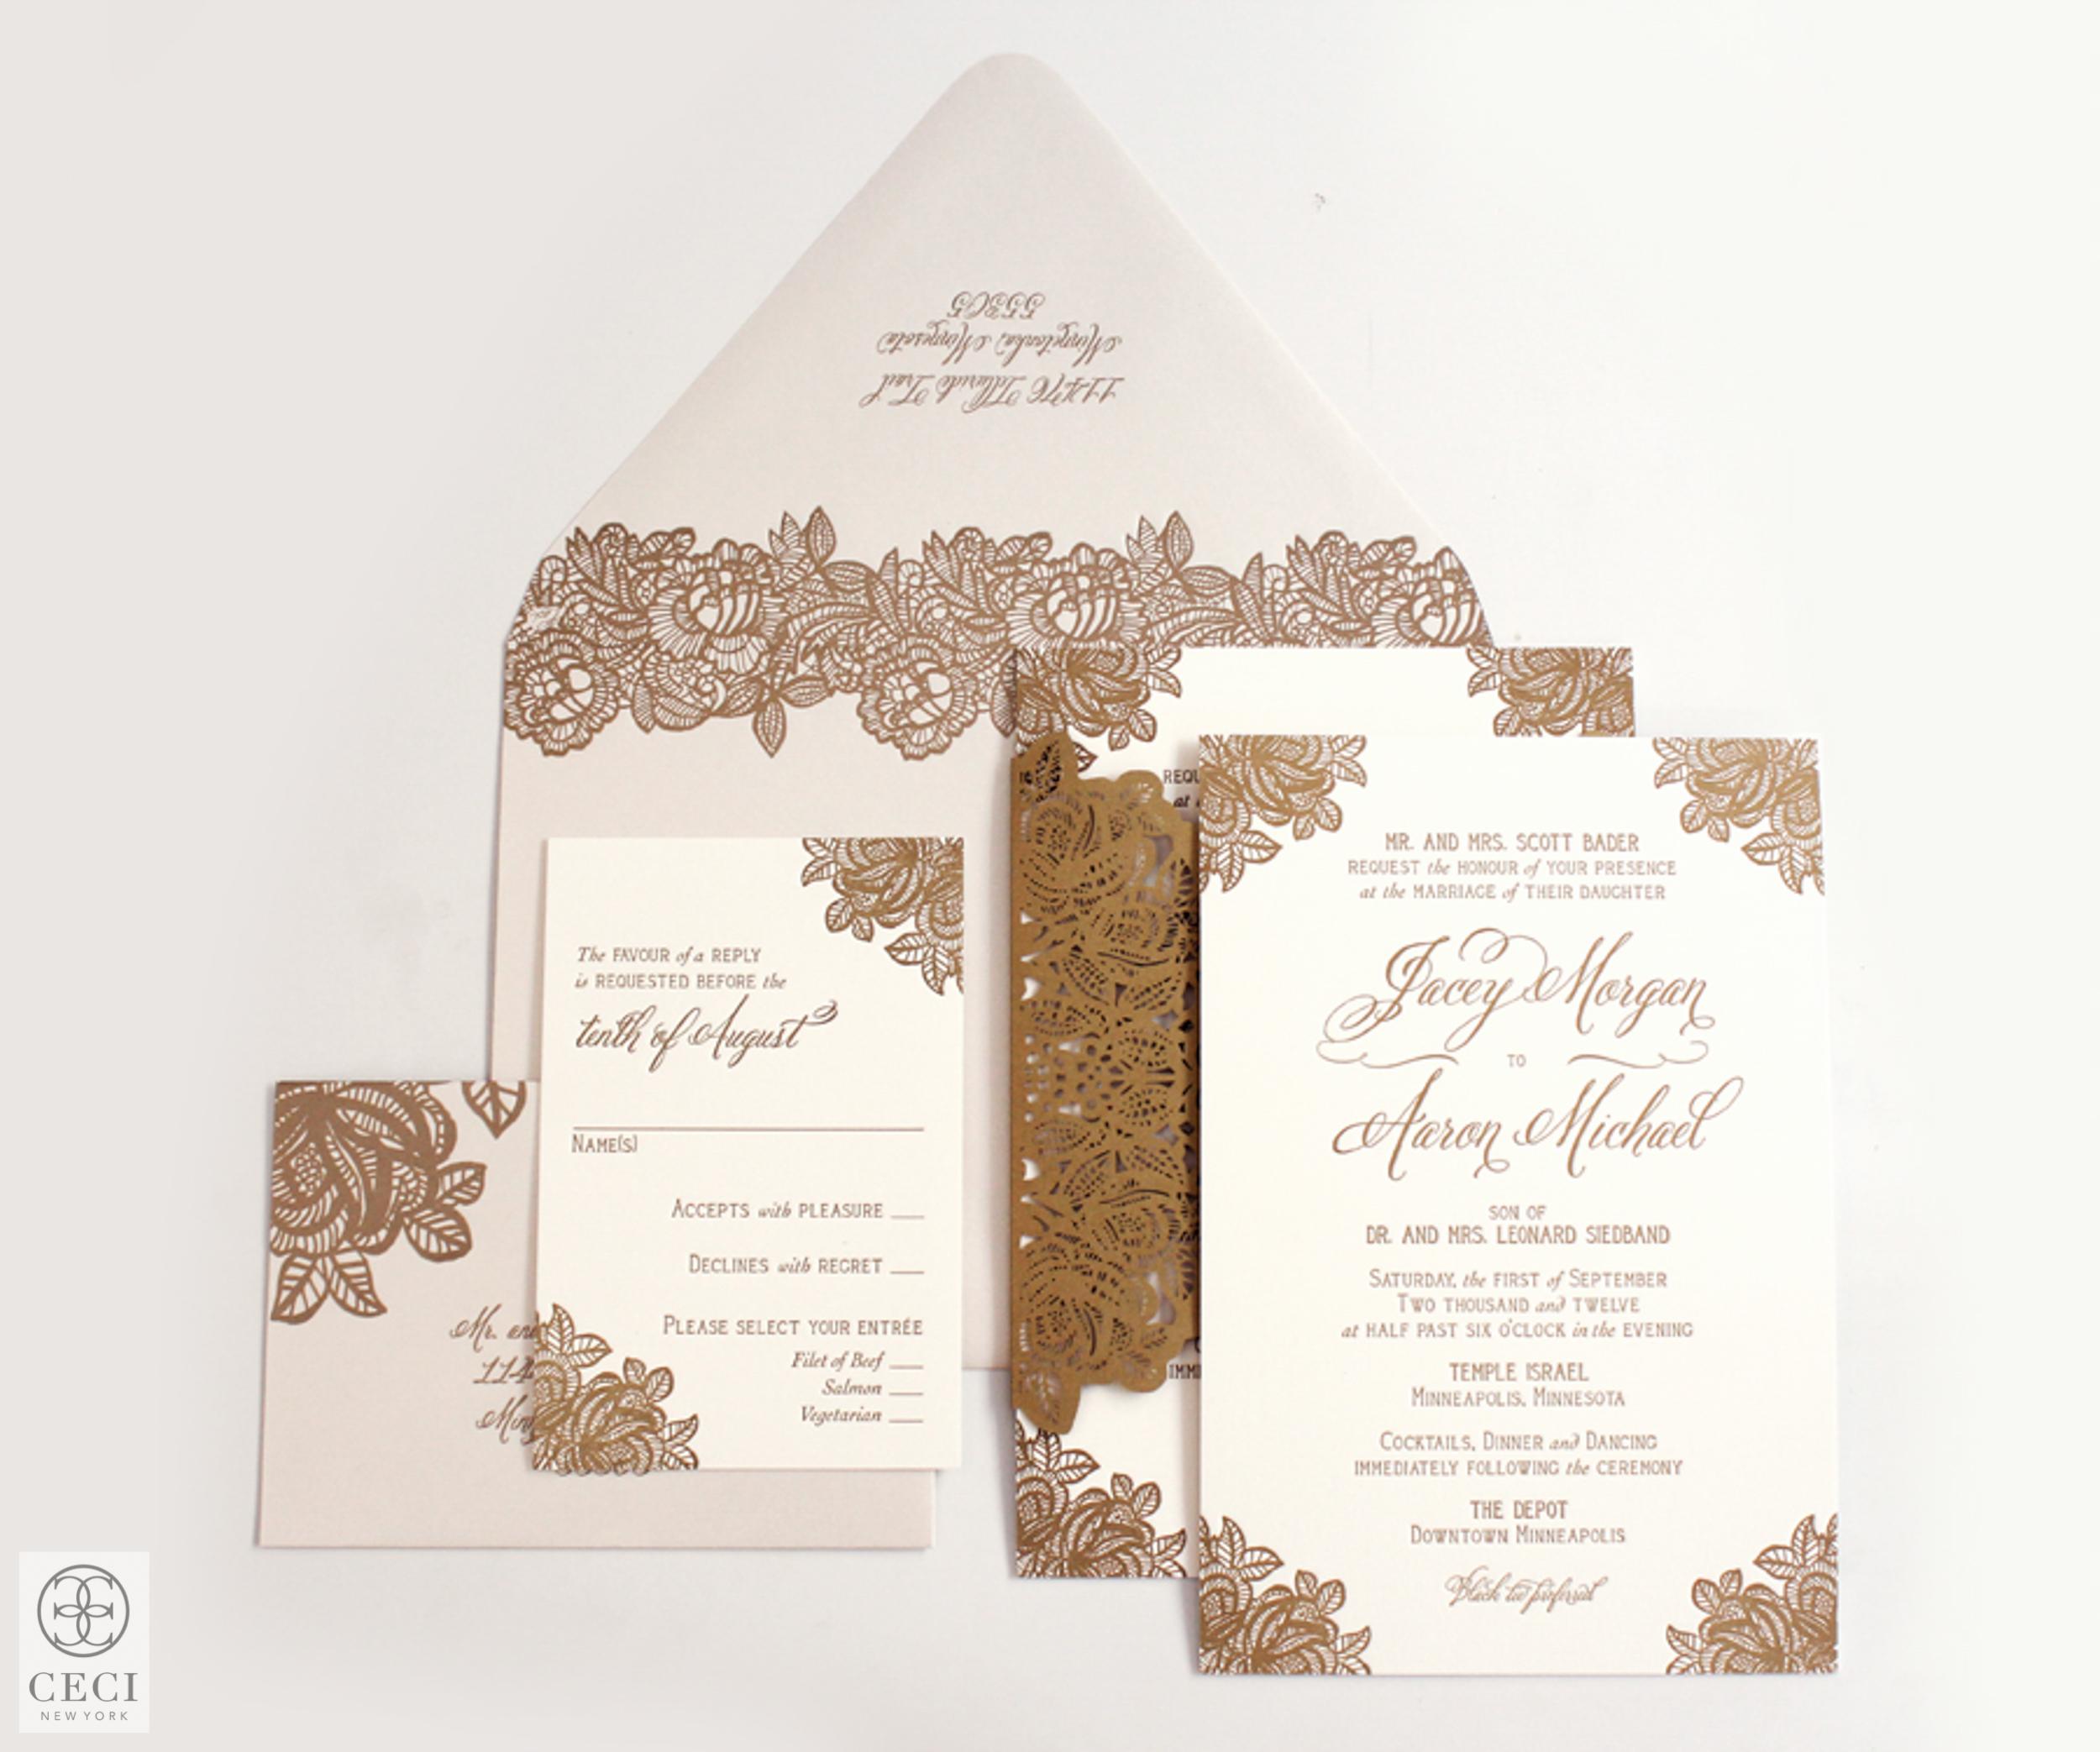 Ceci_New_York_Ceci_Style_Ceci_Johnson_Luxury_Lifestyle_Floral_Lace_Wedding_Letterpress_Inspiration_Design_Custom_Couture_Personalized_Invitations_-8.jpg